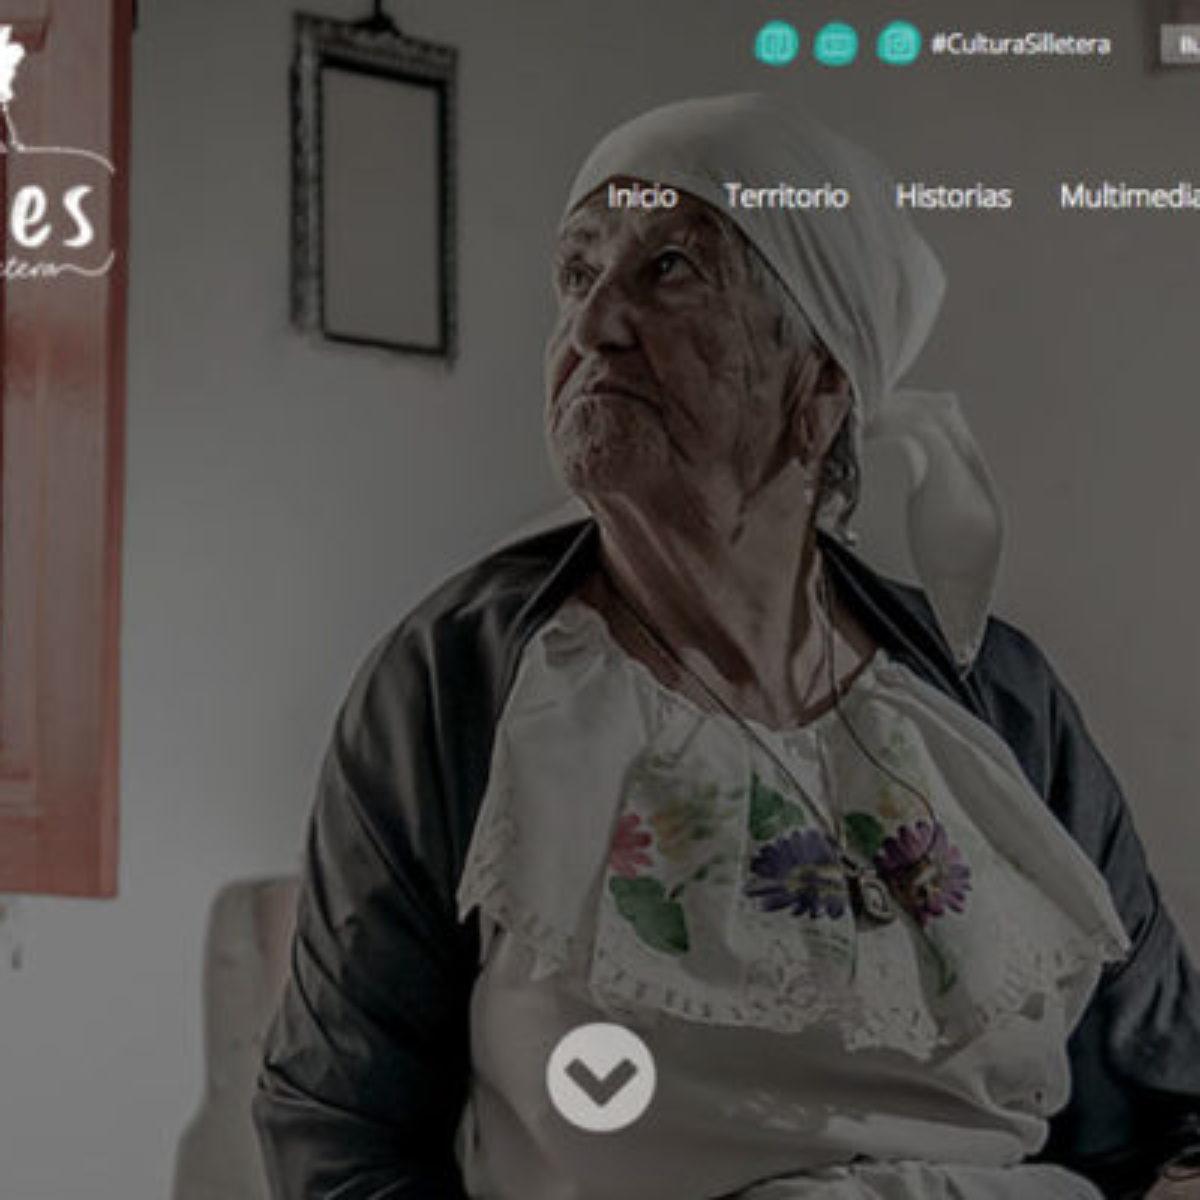 Imagen web Raíces, cultura silletera